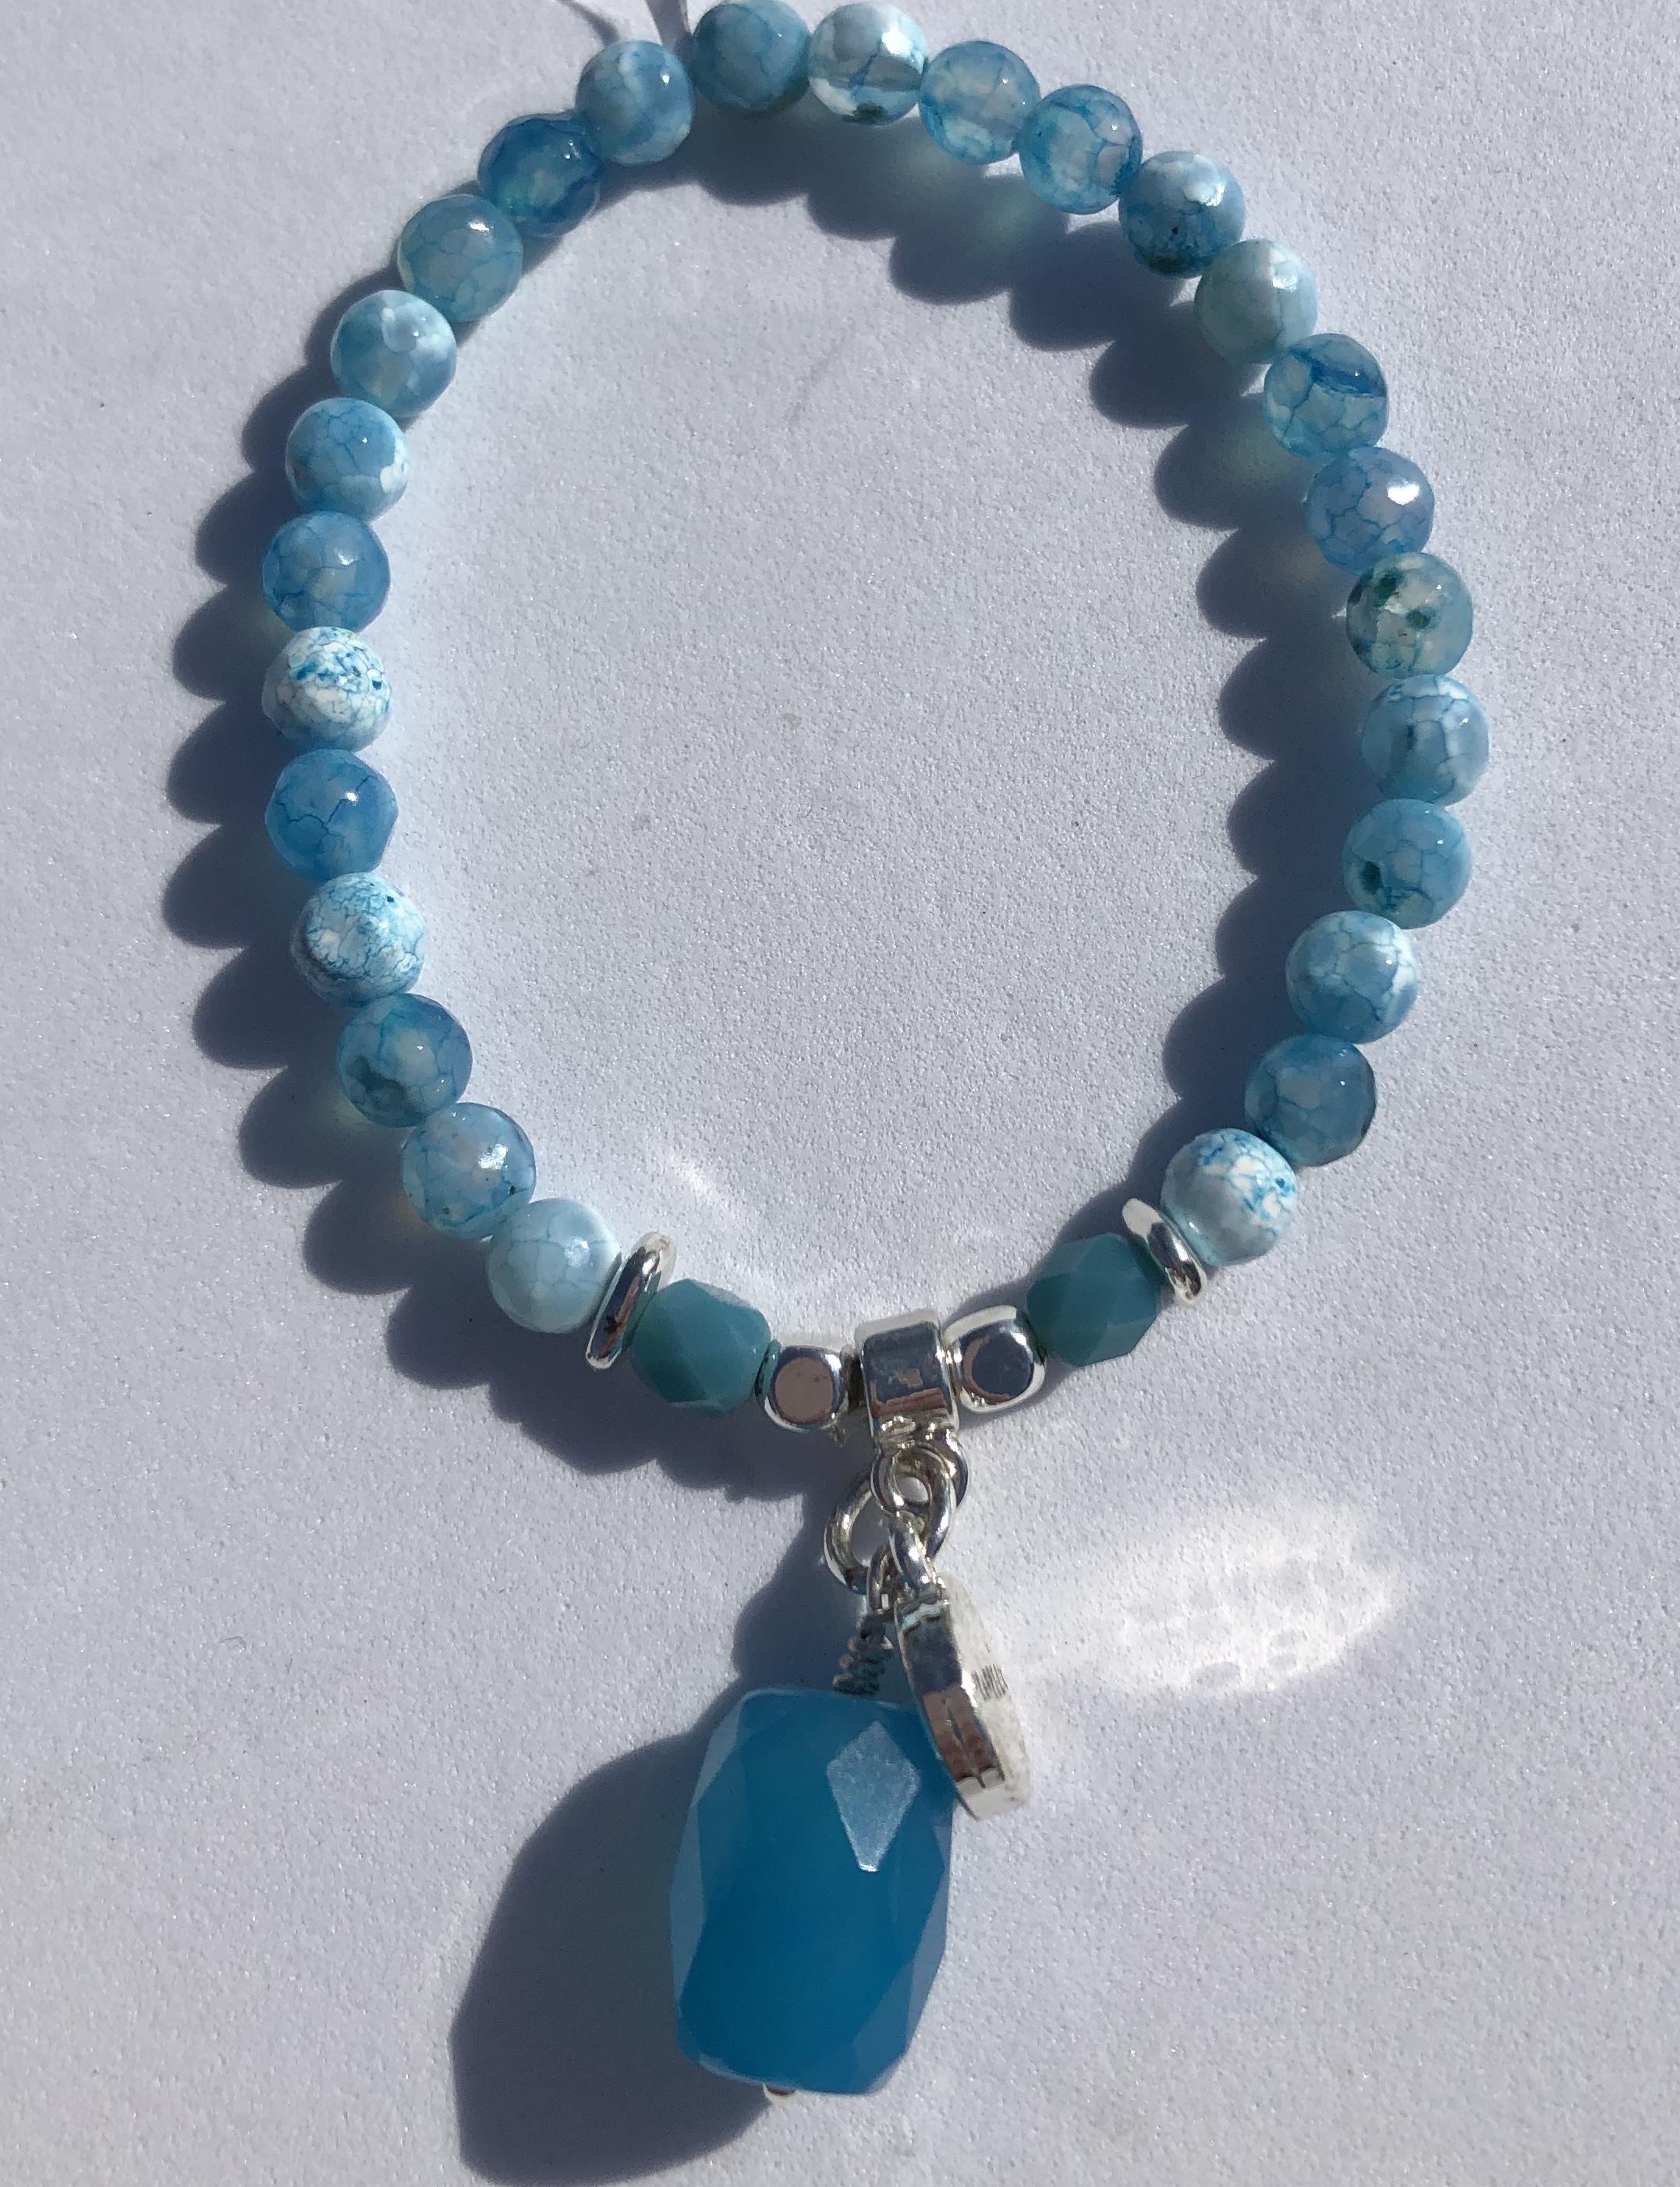 Pranella St Lucia Brazil bauble bracelet